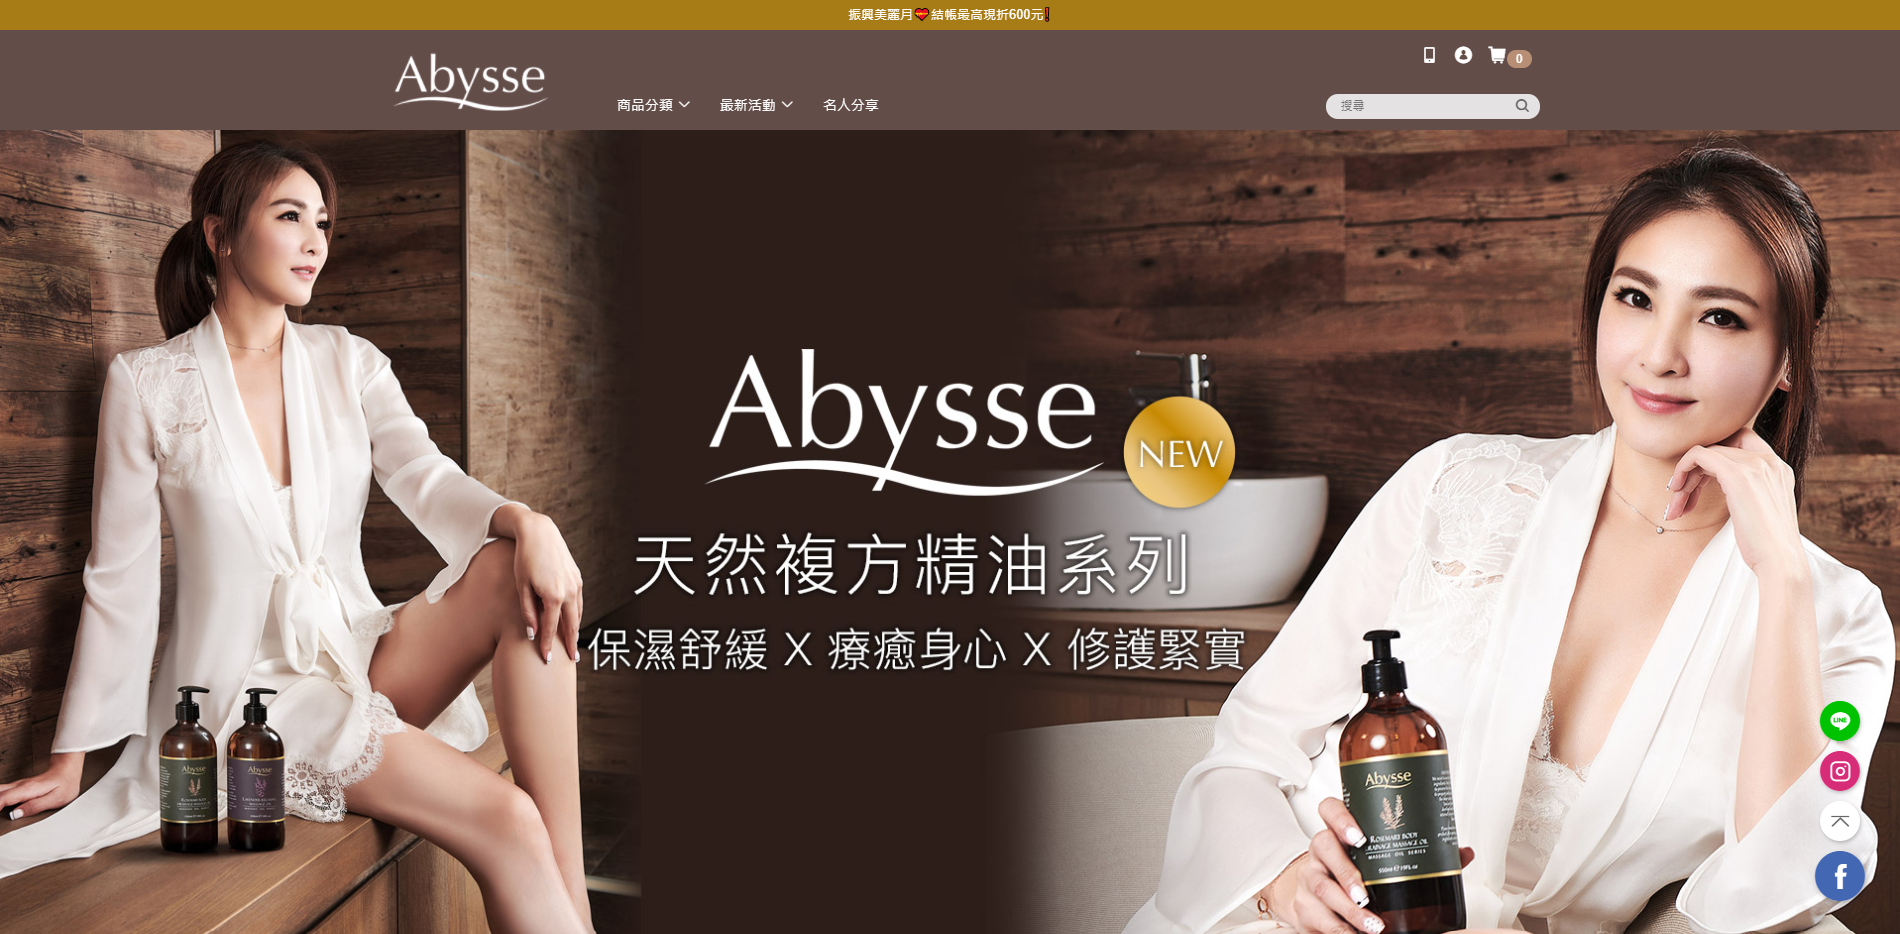 Abysse 官方網站